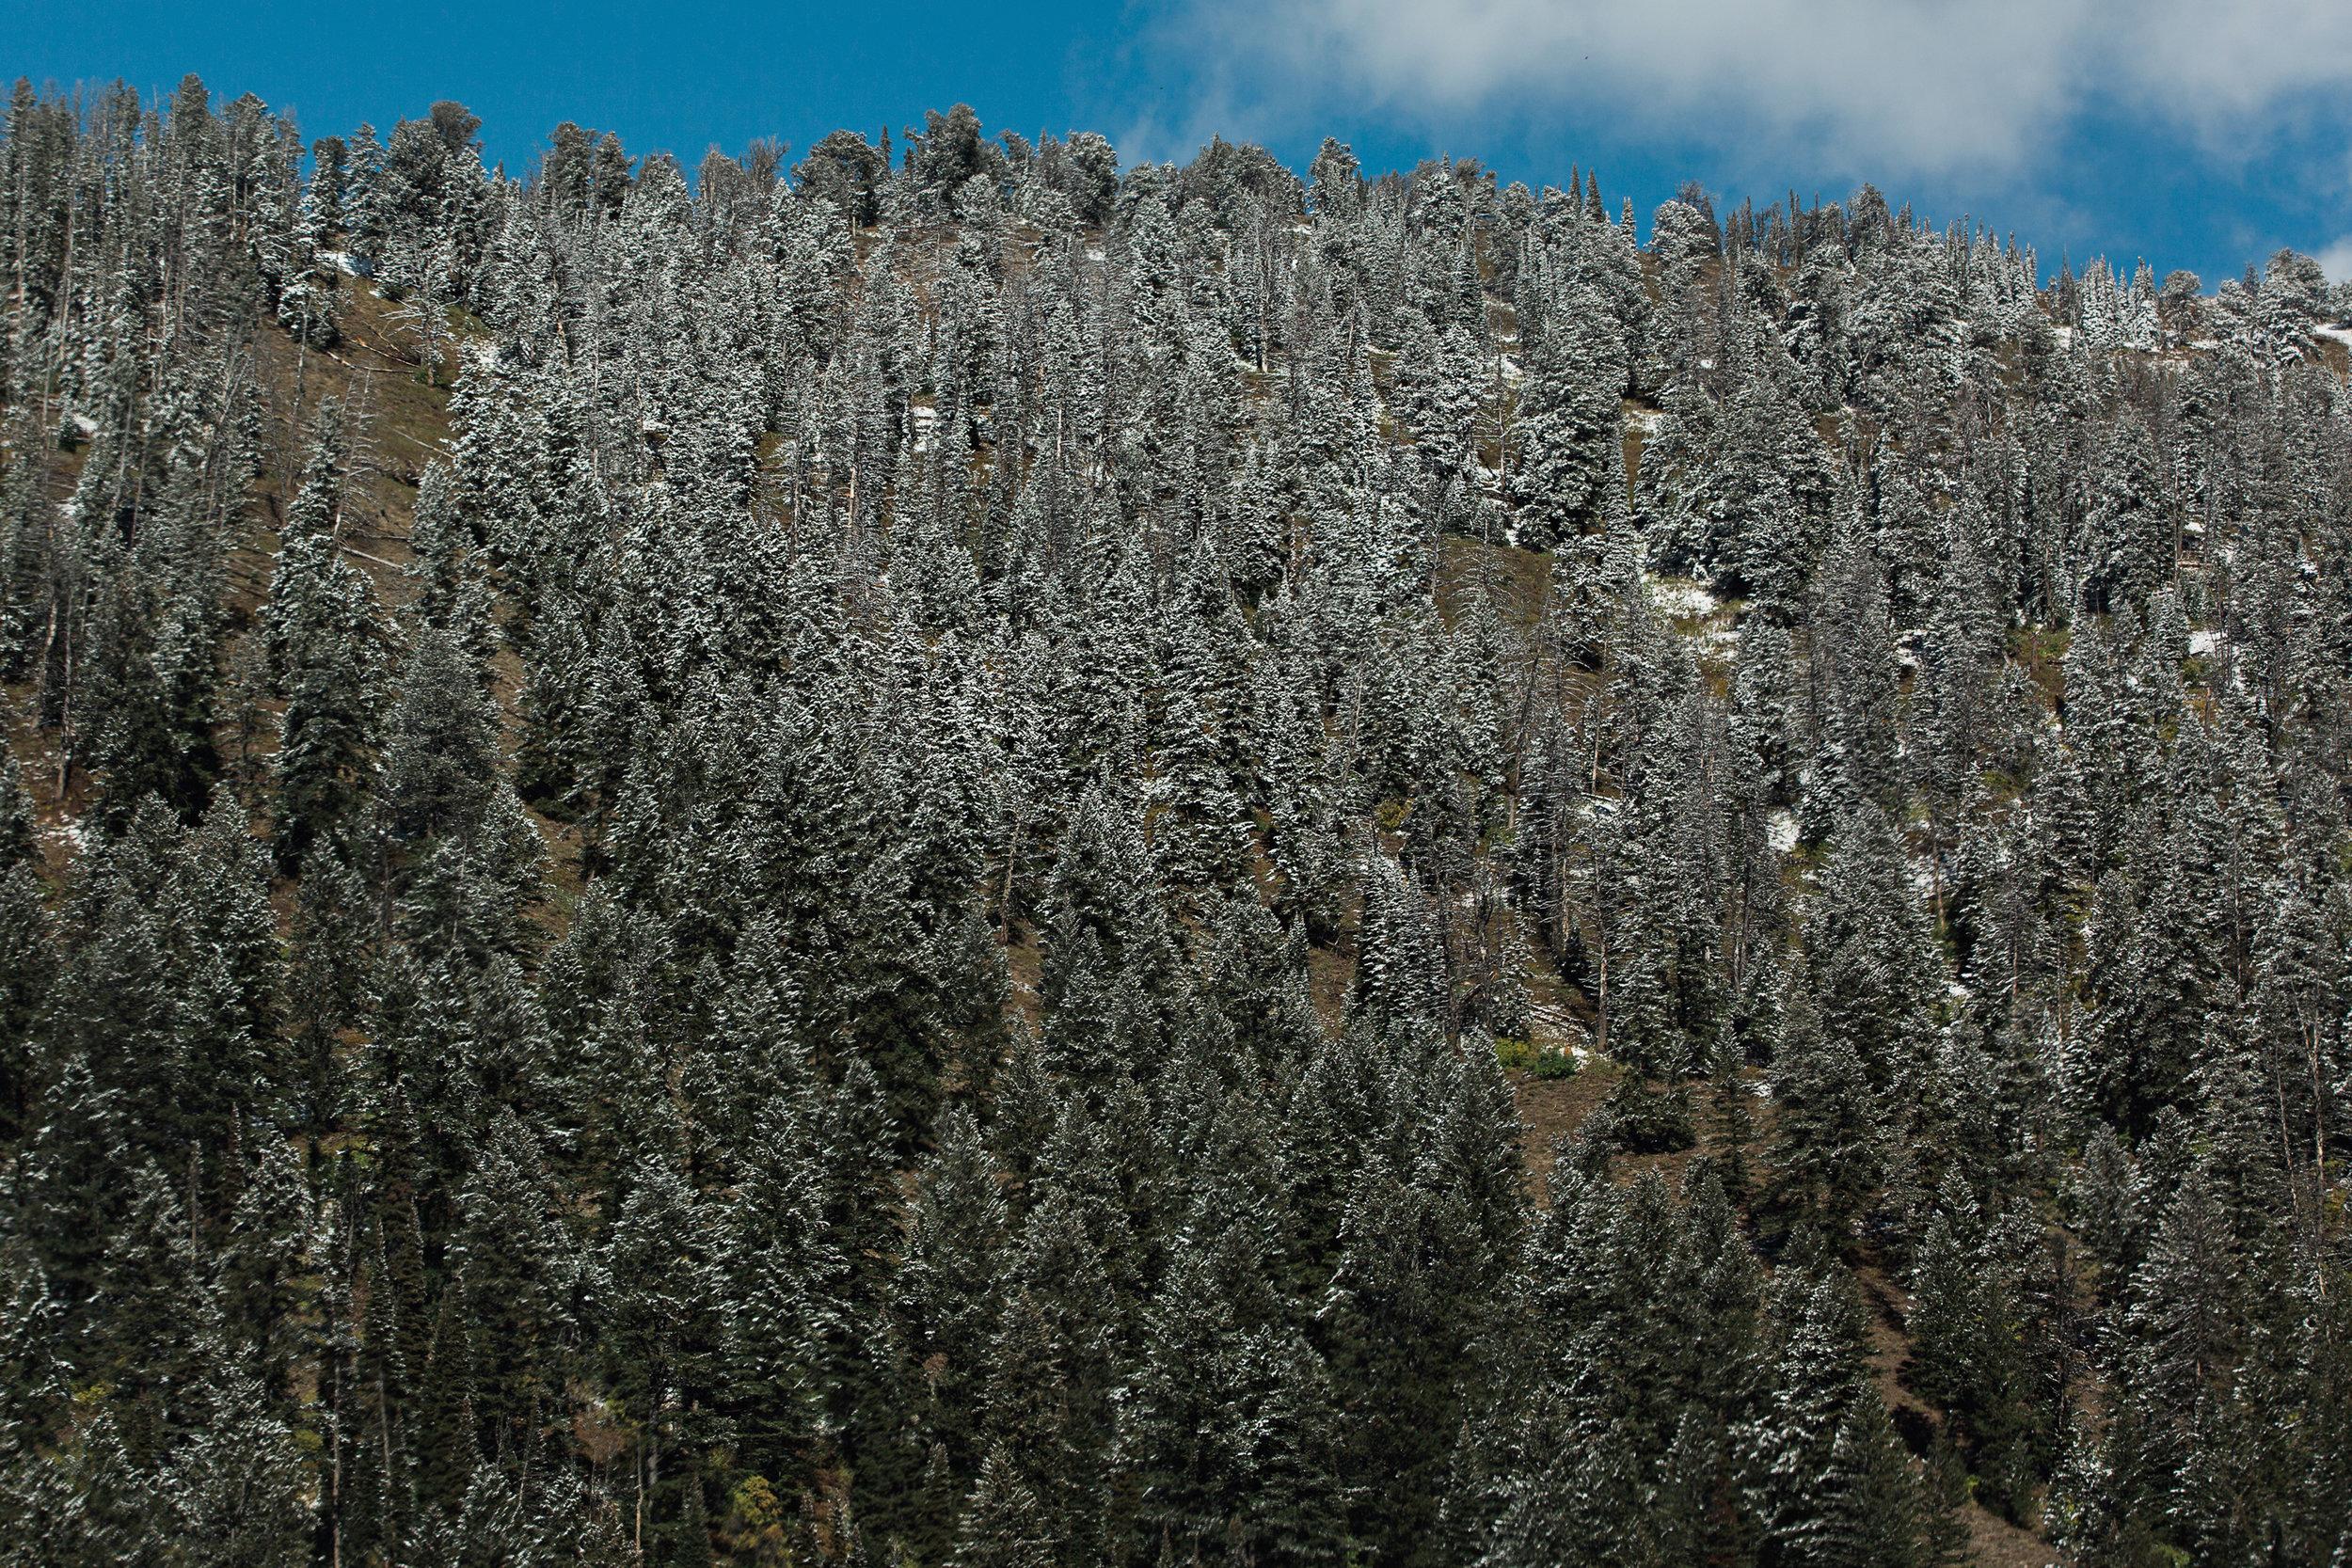 Cindy_Giovagnoli_Idaho_Wyoming_Grand_Teton_National_Park_autumn_aspens_camping_mountains-011.jpg